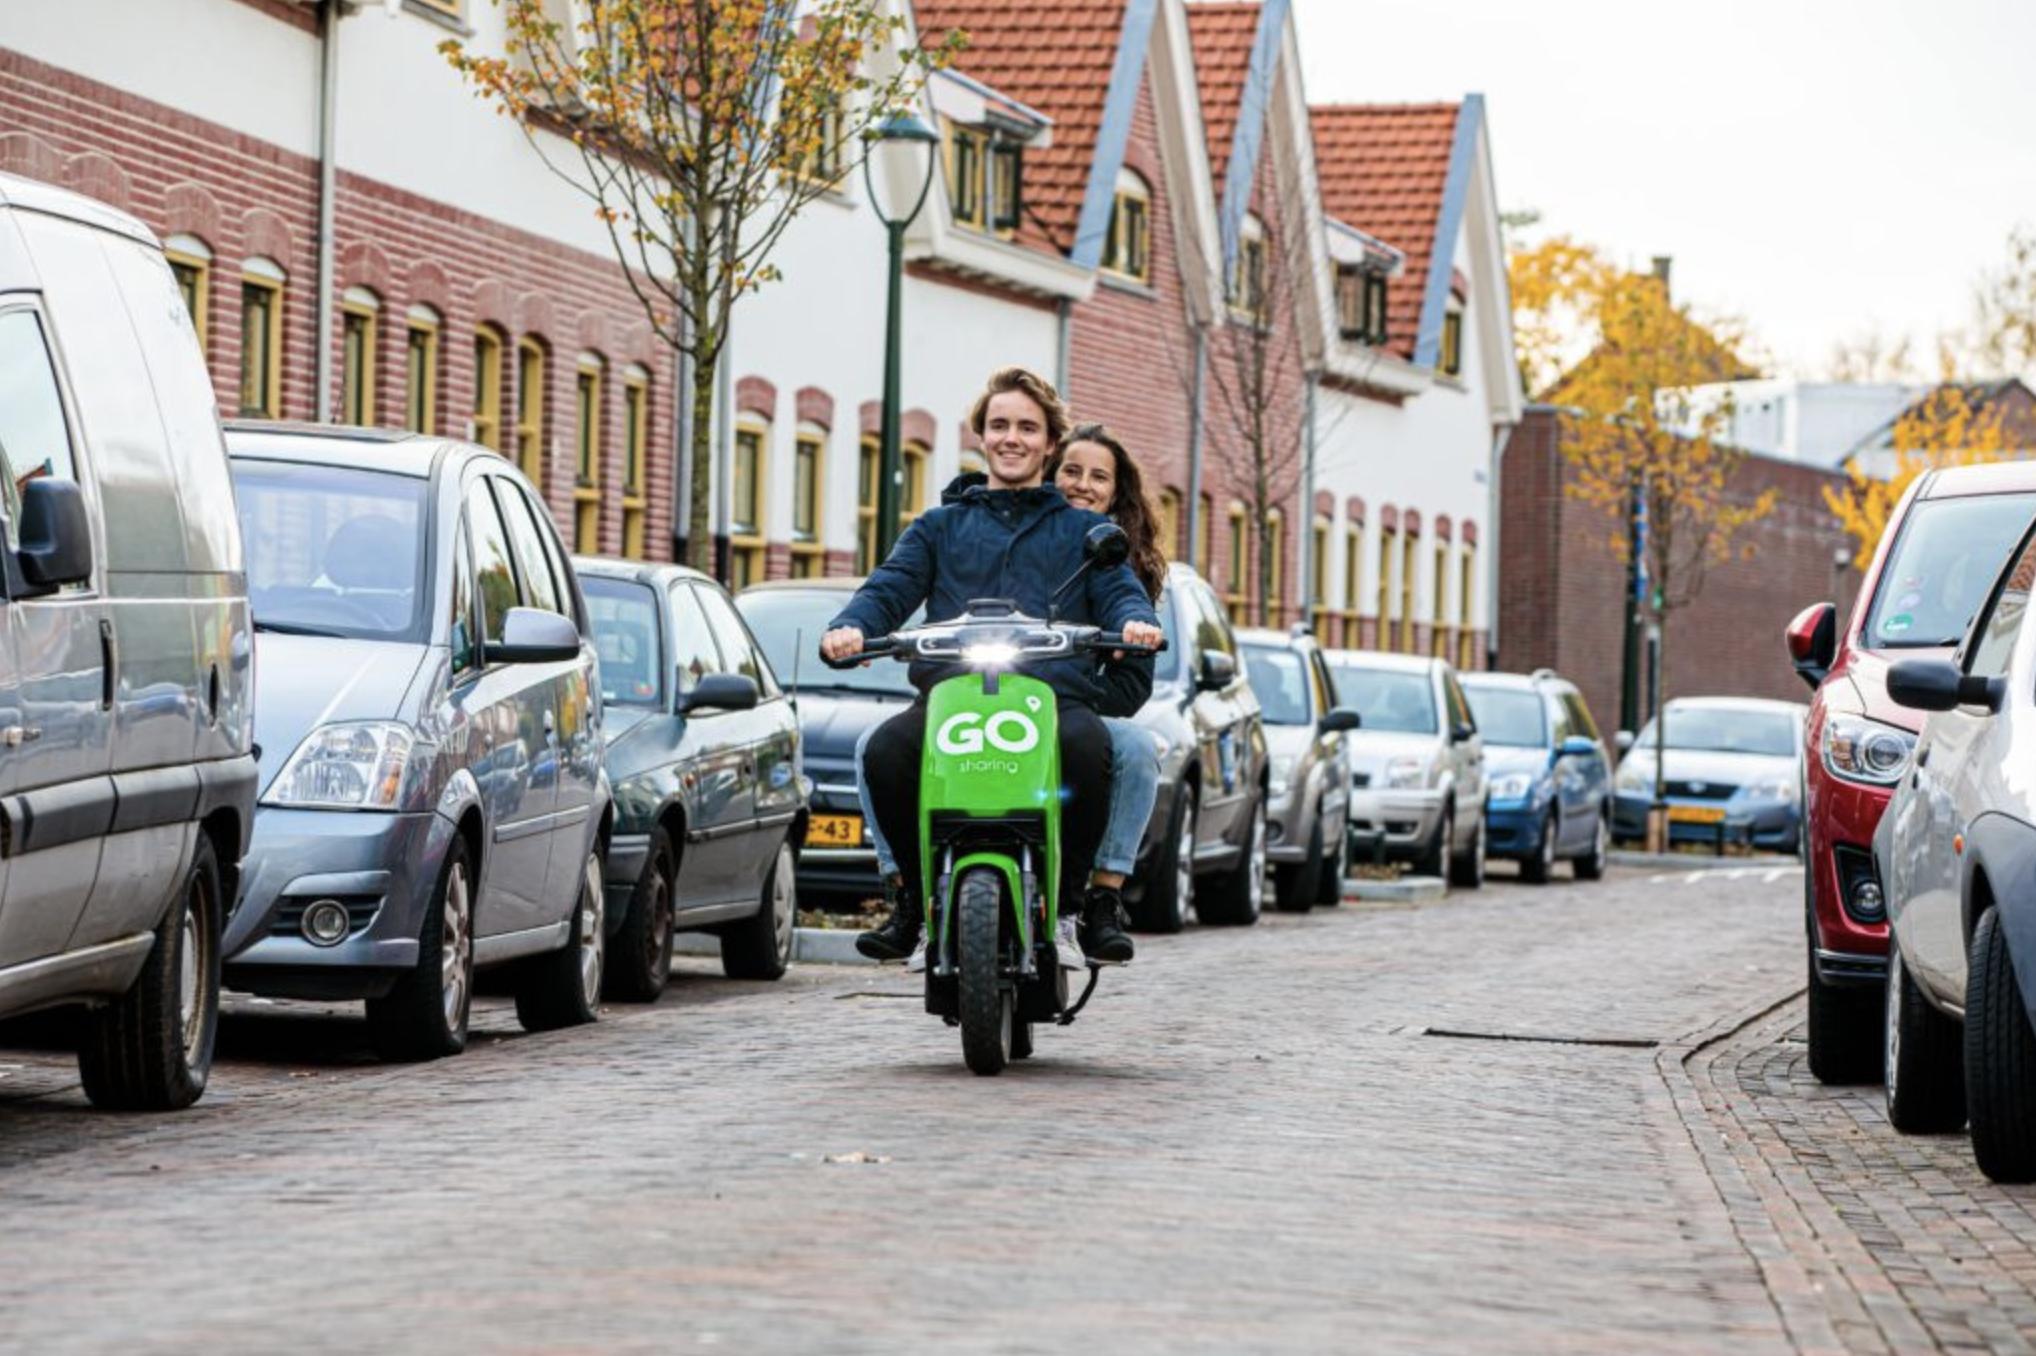 go sharing deelscooter